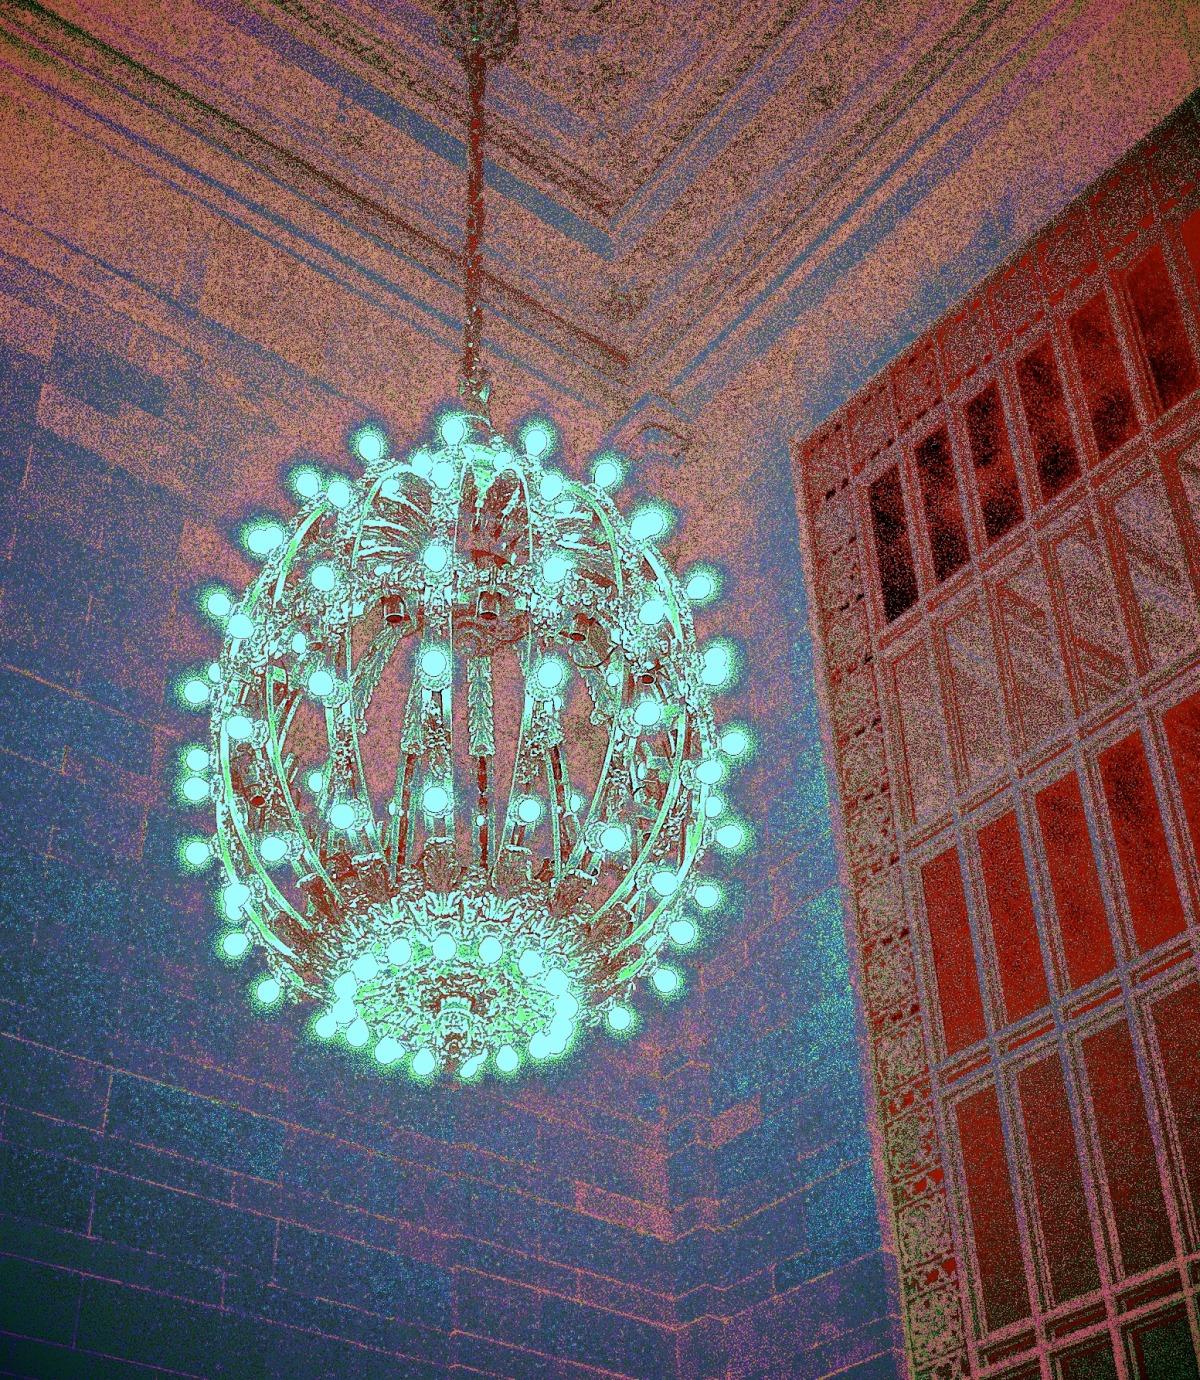 lampshade 9.17 upload 3.jpg